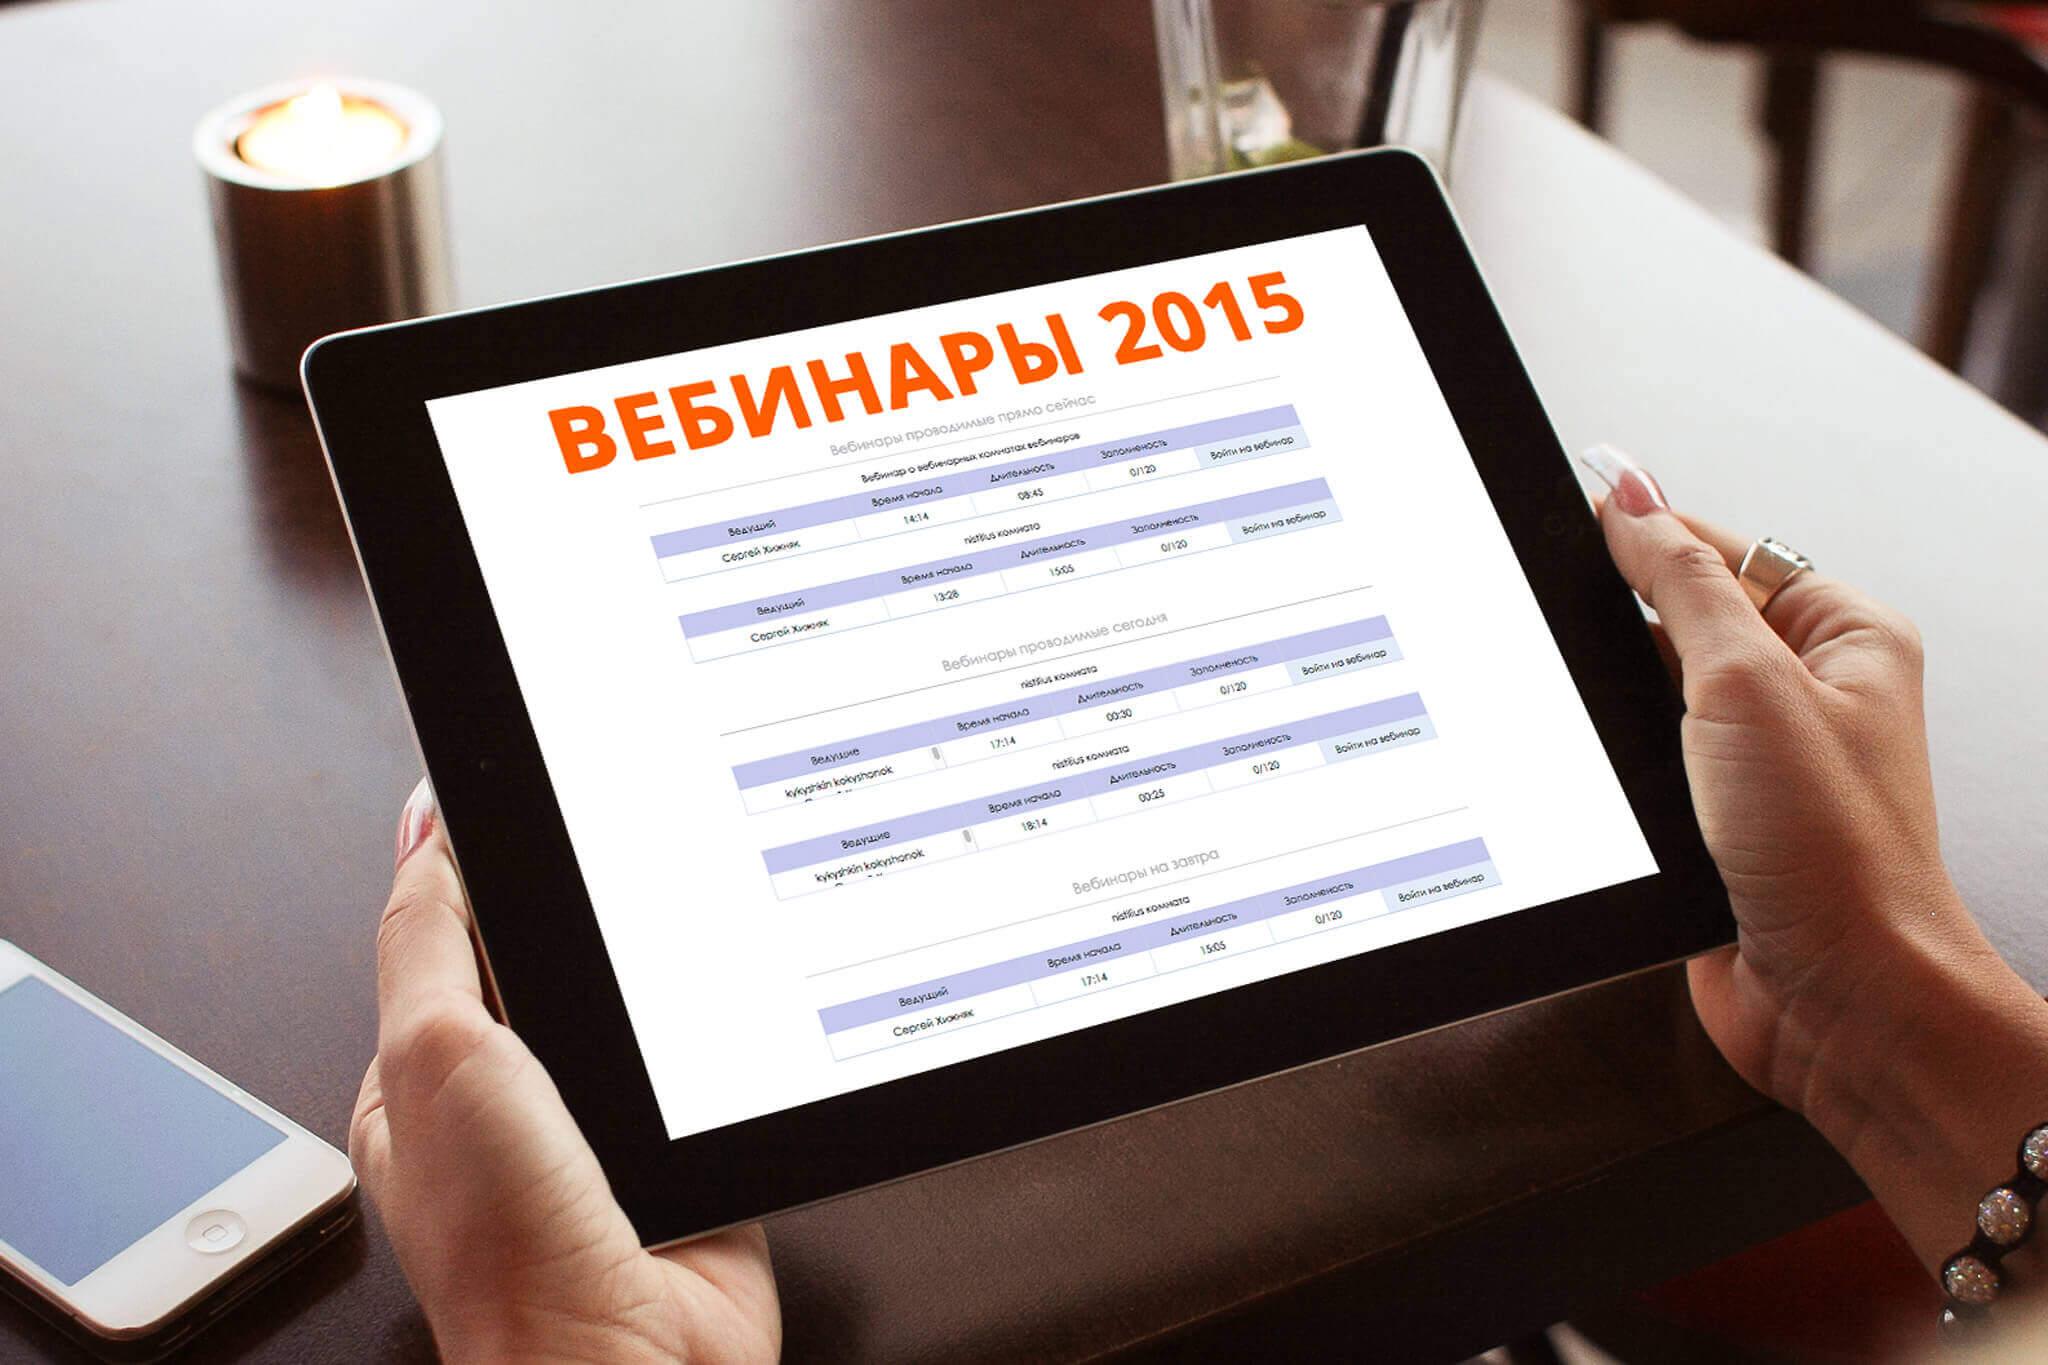 вебинары-2015